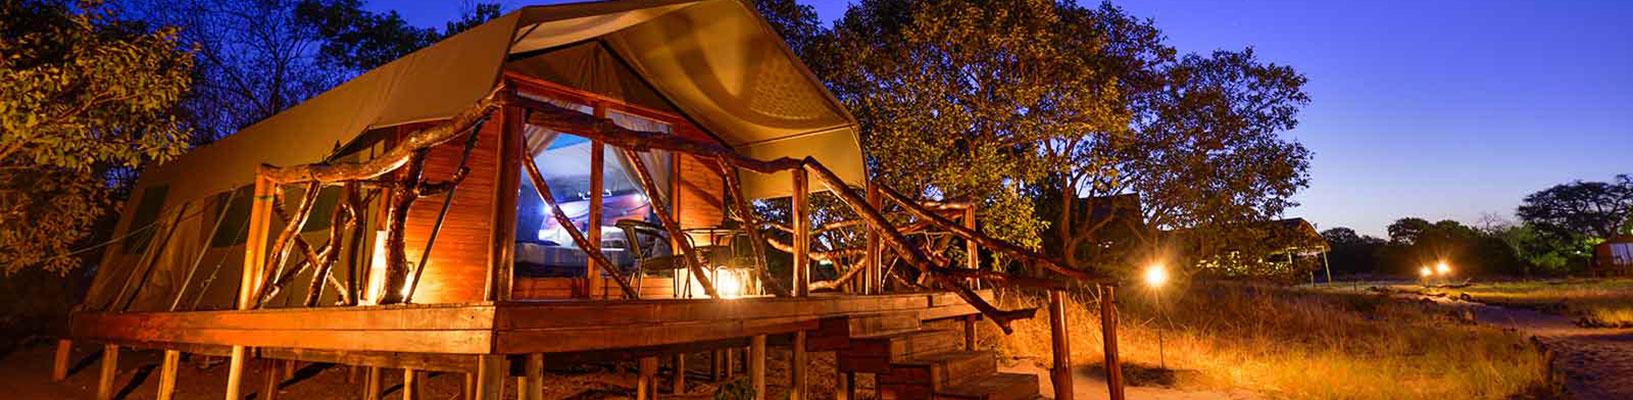 Camp-Savuti-tent-exterior-night.jpg